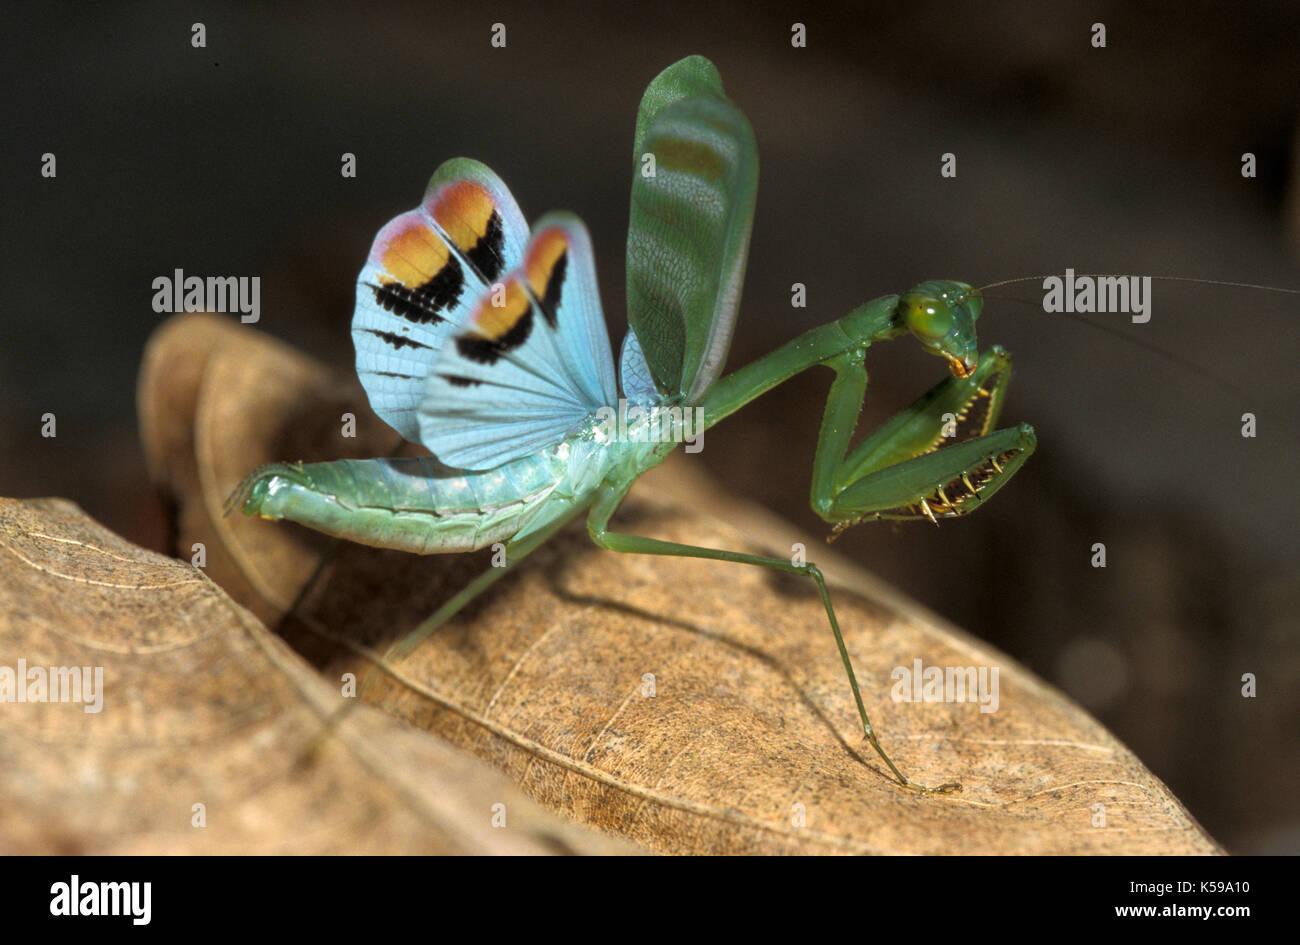 Praying Mantis Hymenopodidae Danum Valley Sabah Borneo